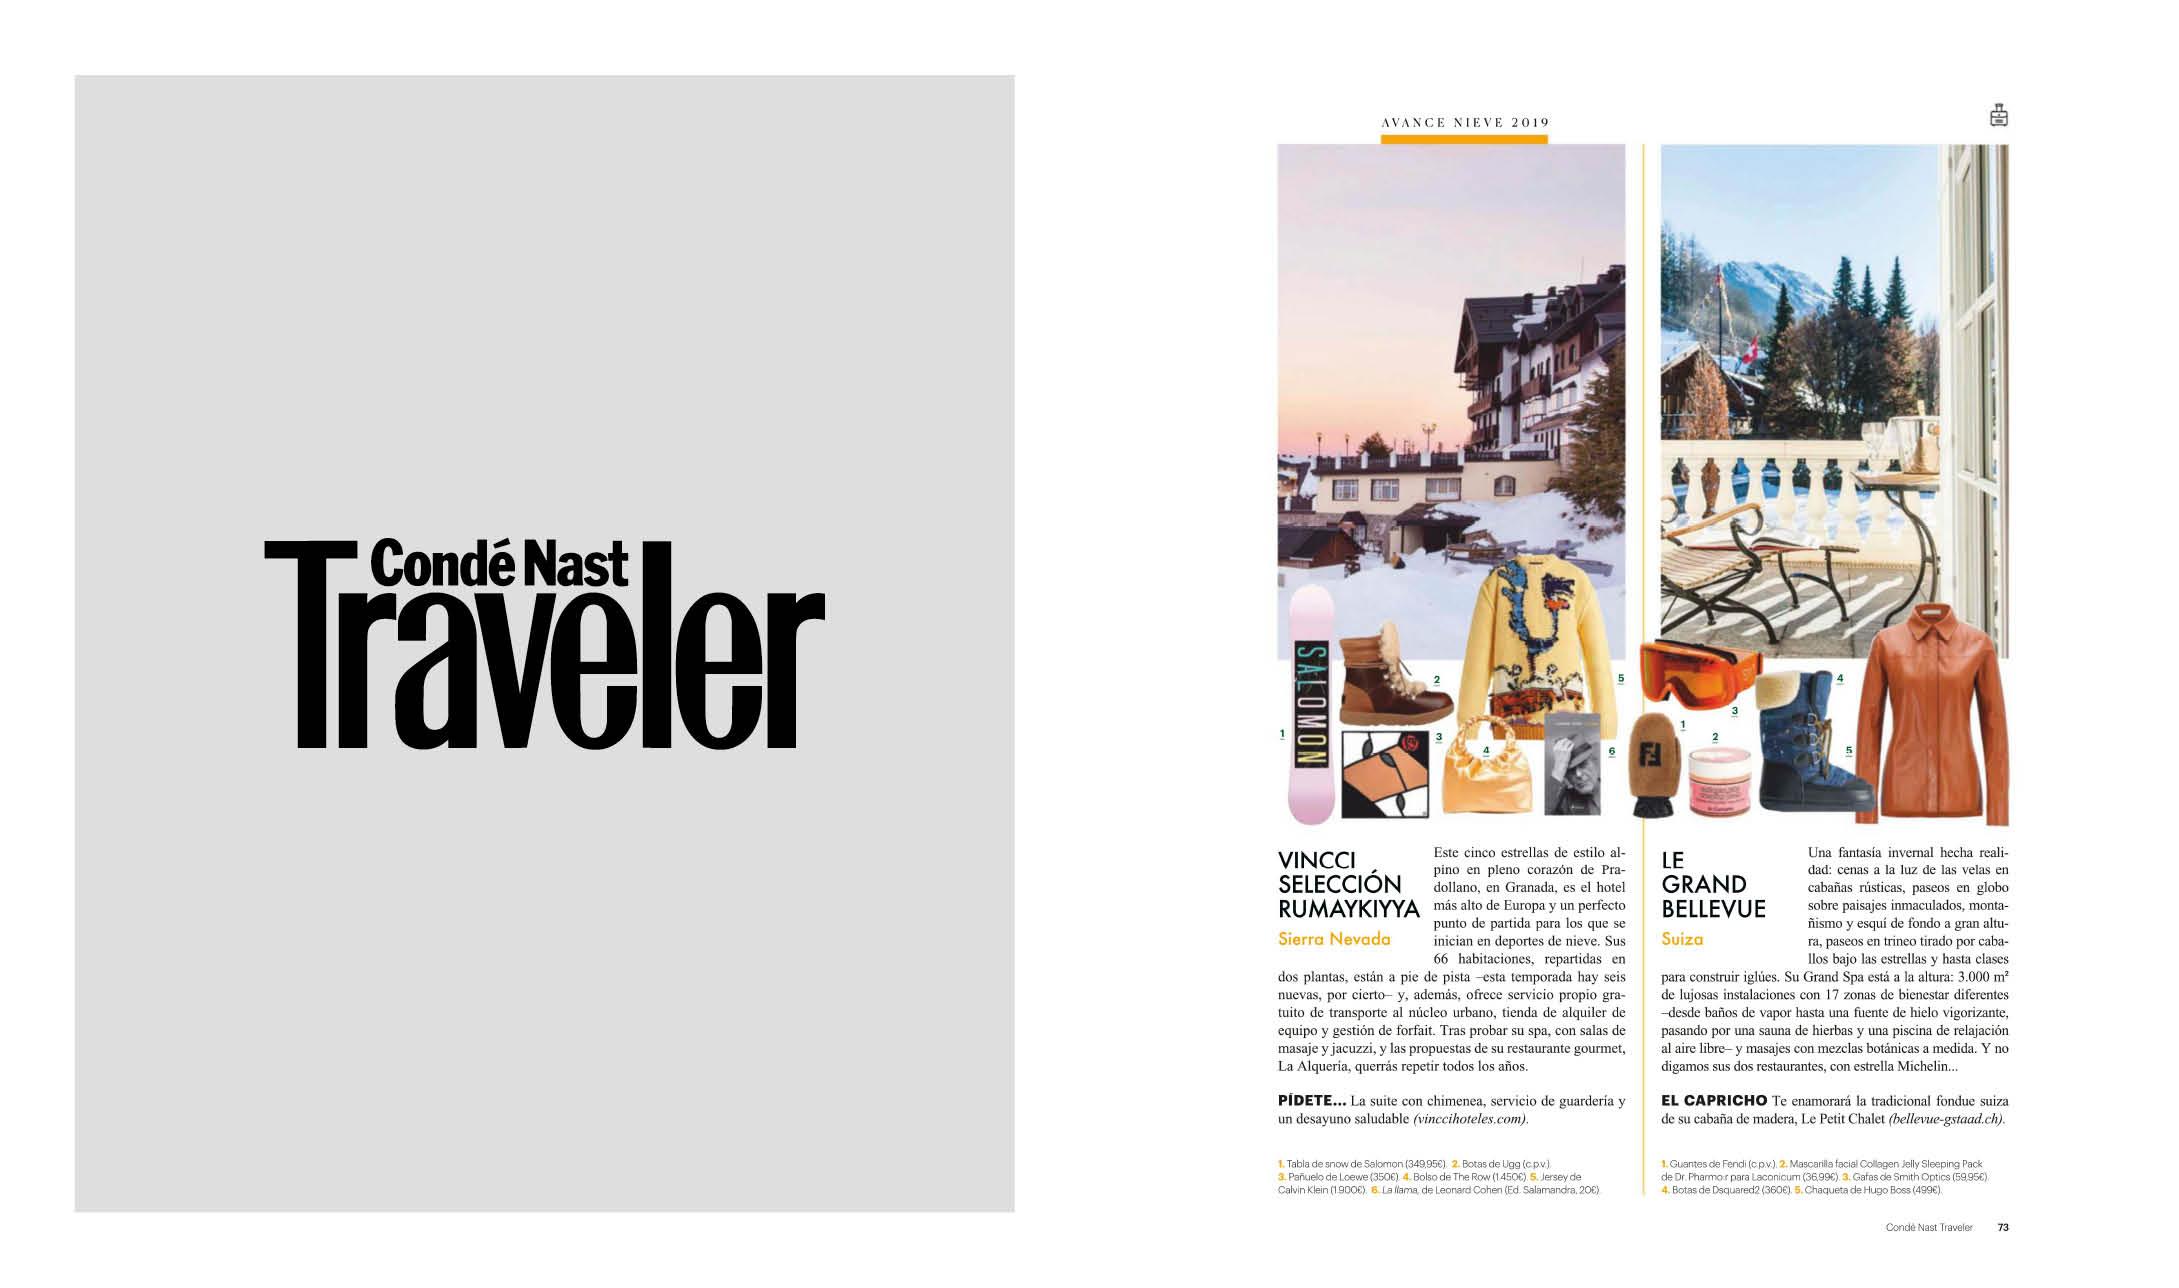 7.WEB_PRENSA7_CONDENAST TRAVELLER_VINCCI HOTELES